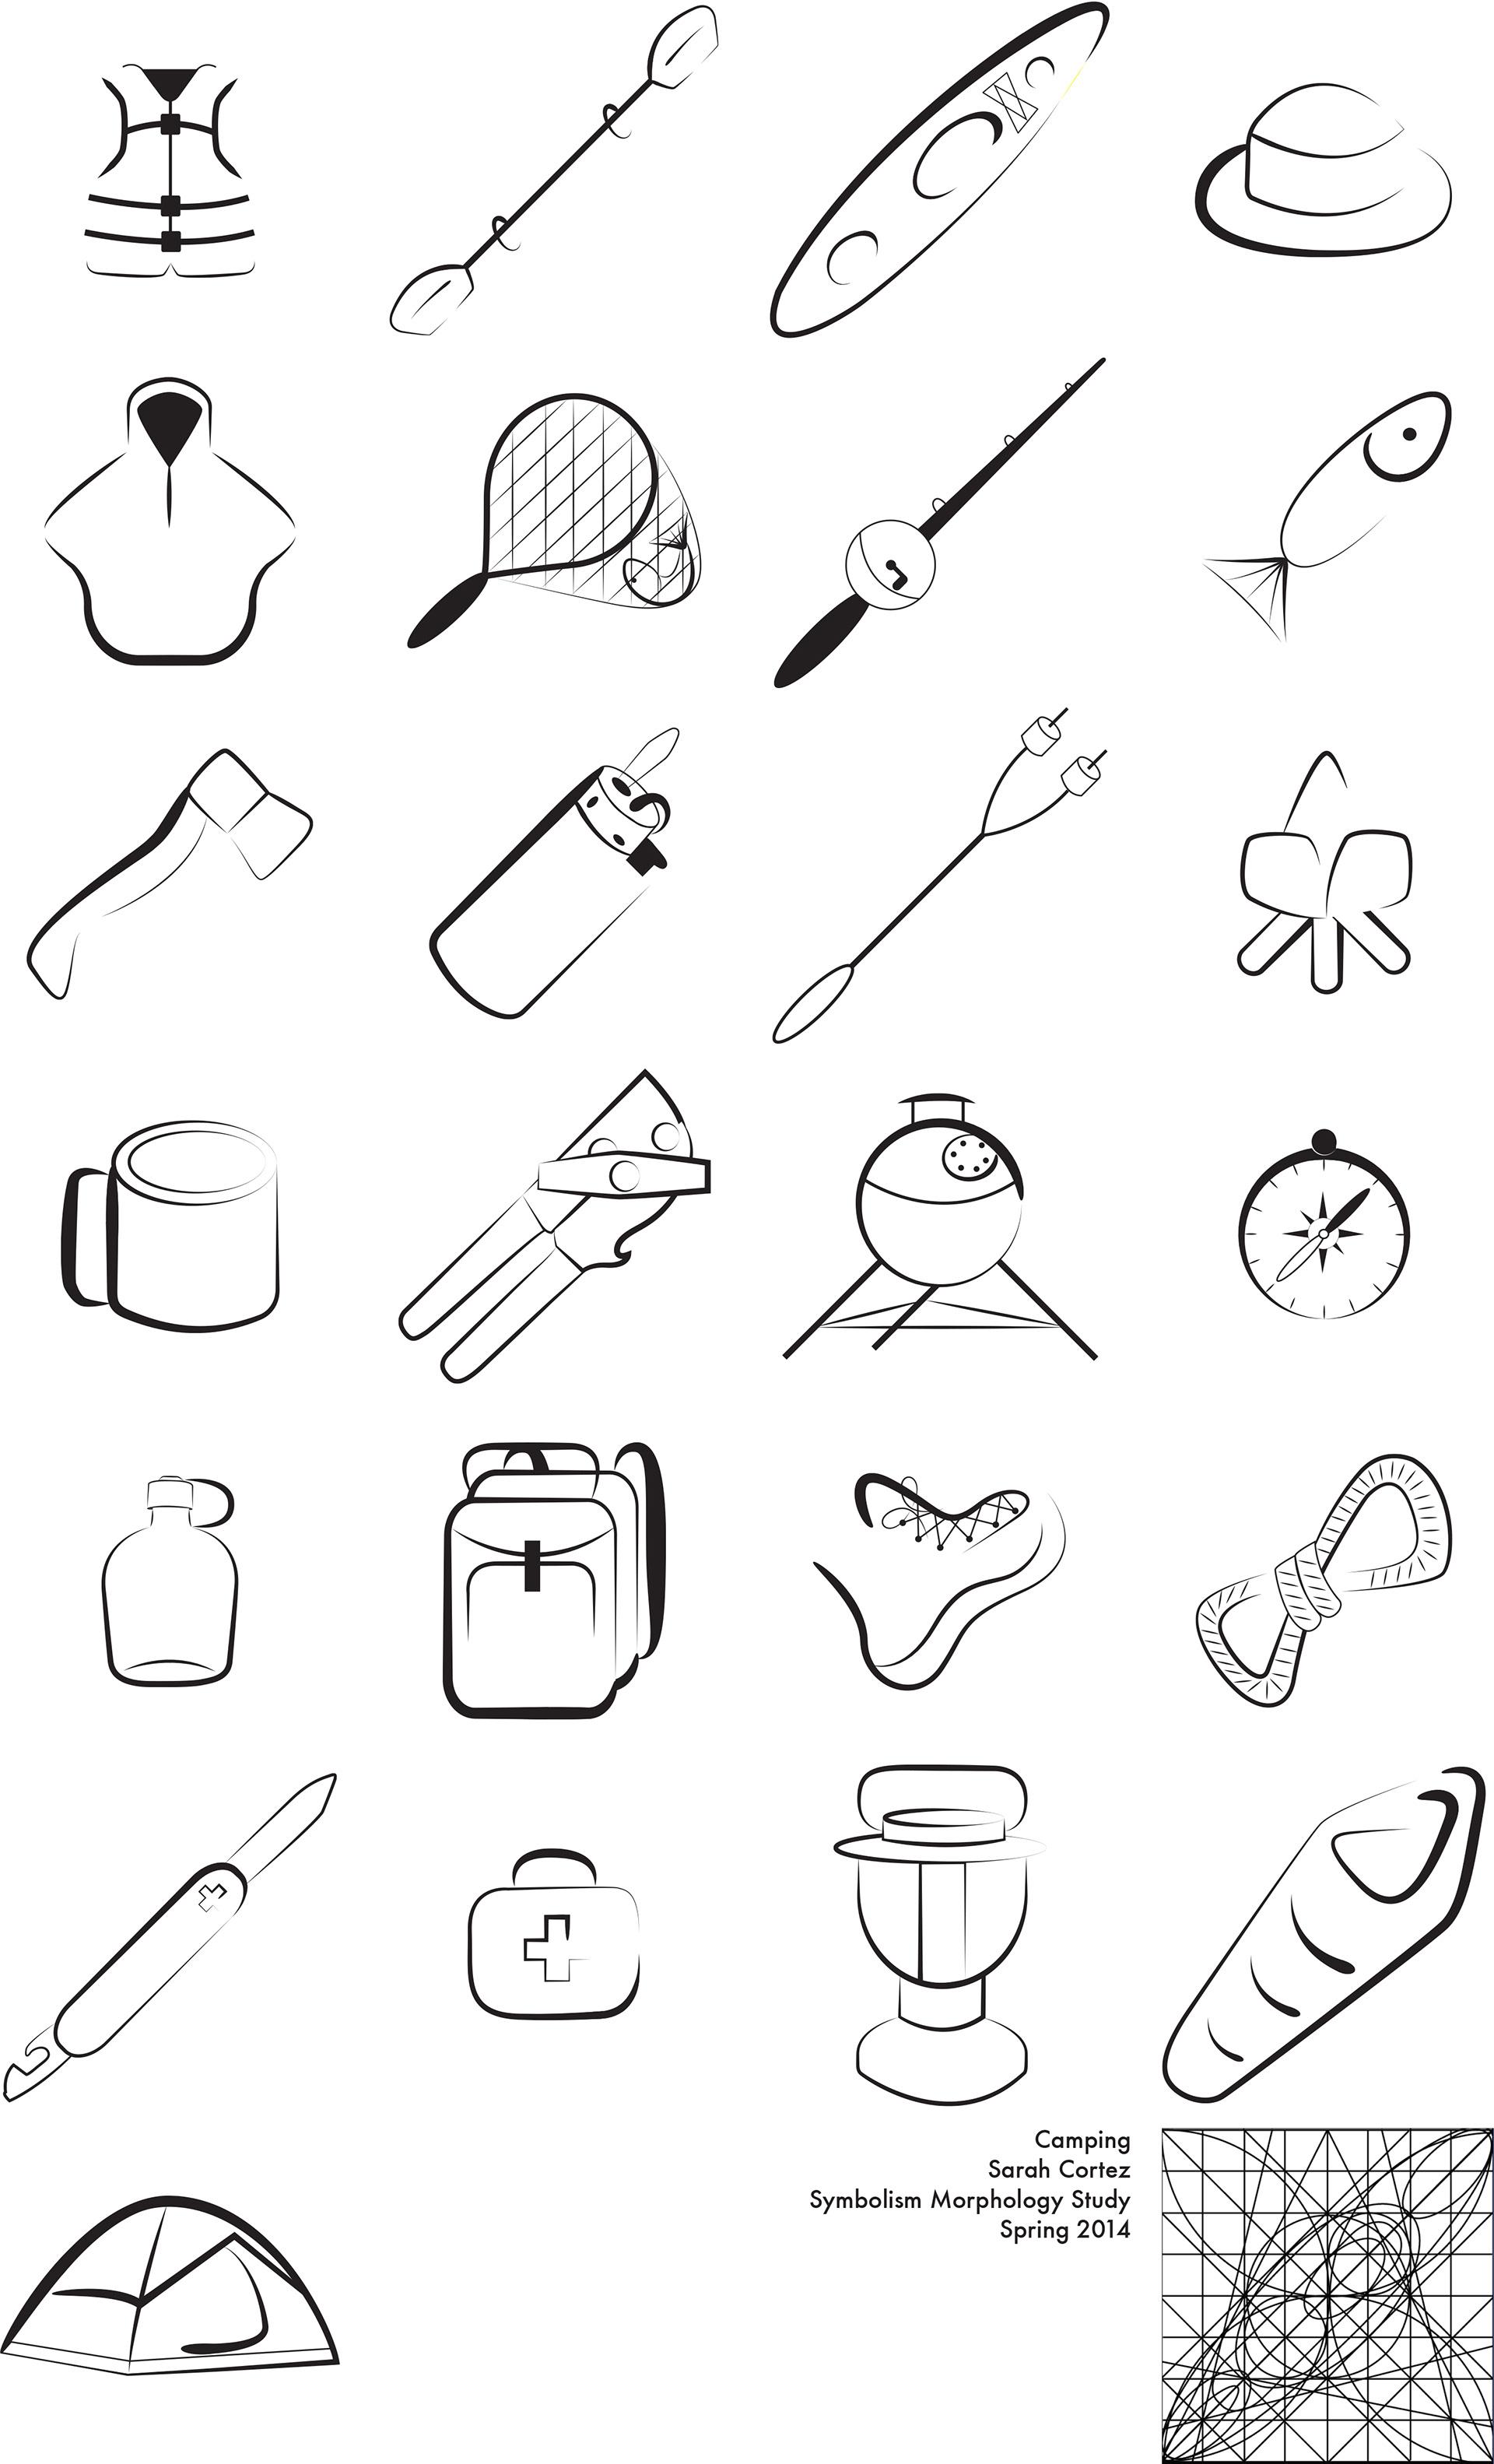 Sarah Cortez Symbol Morphology Study